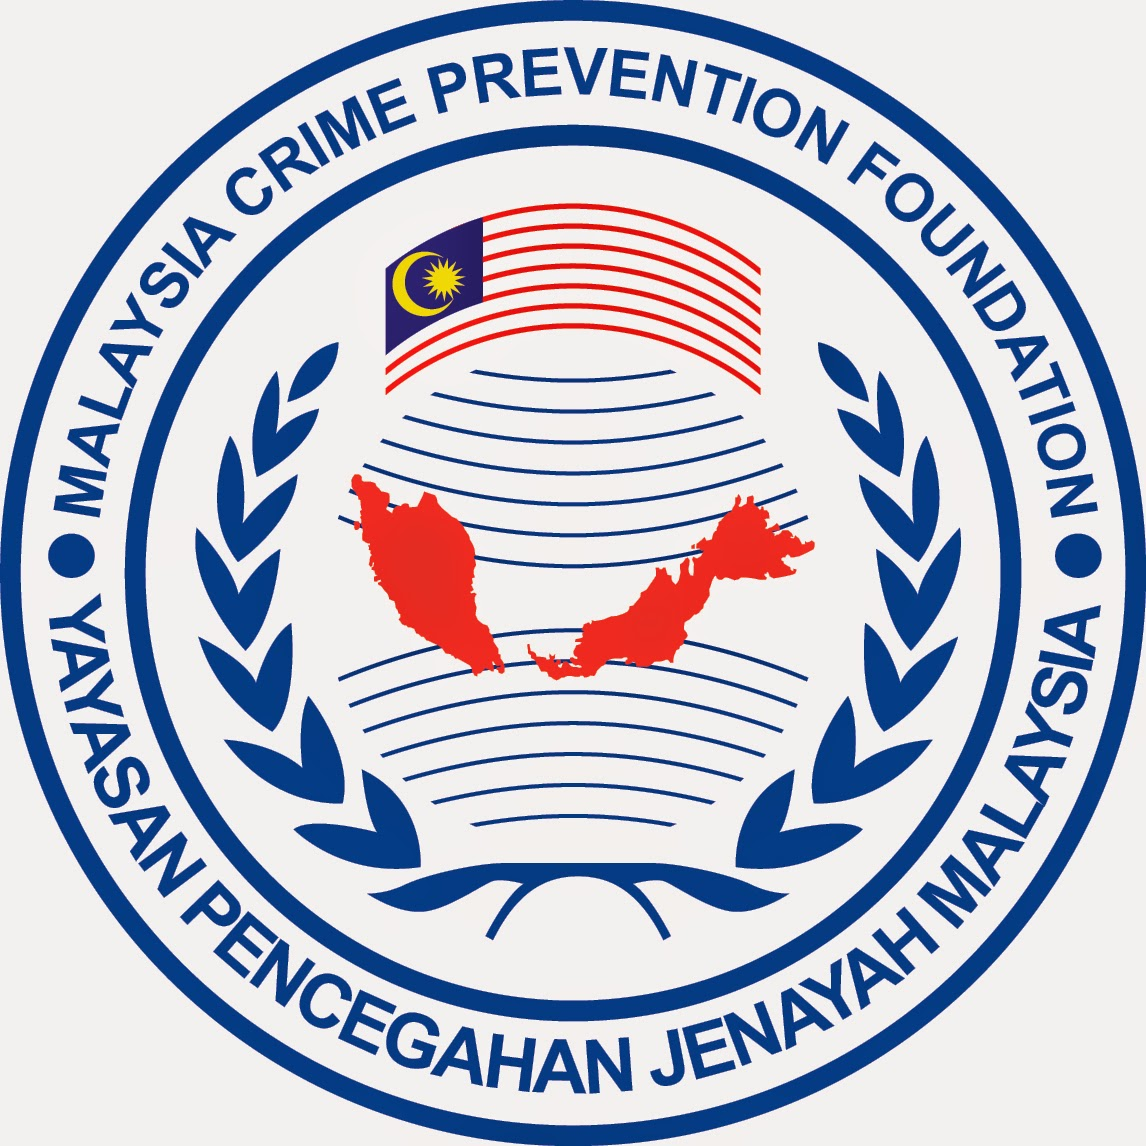 Yayasan Pencegahan Jenayah Malaysia - Kelantan